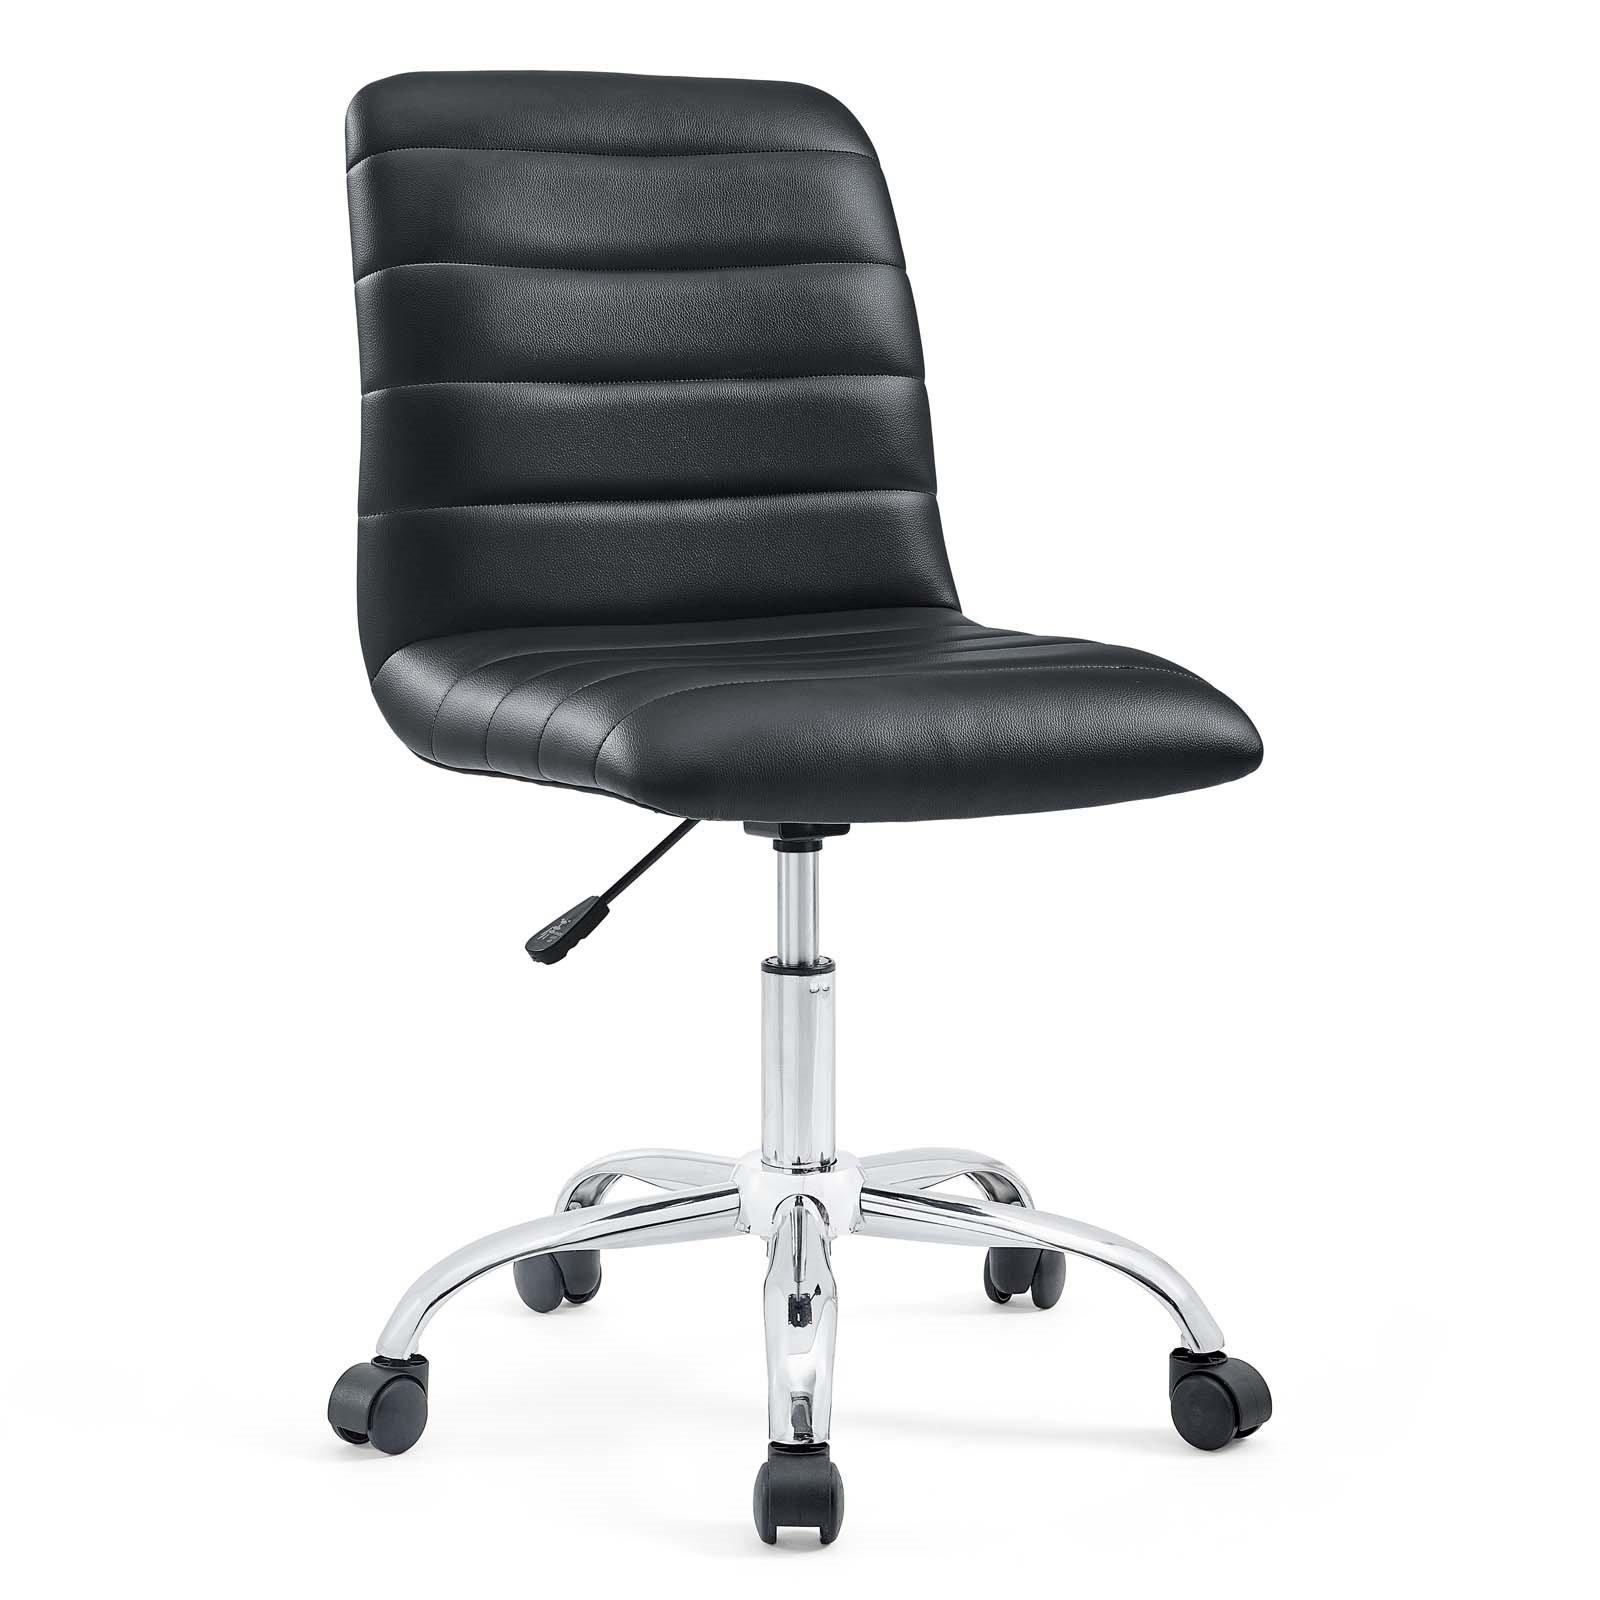 Armless Mid Back Vinyl Office Chair in Black